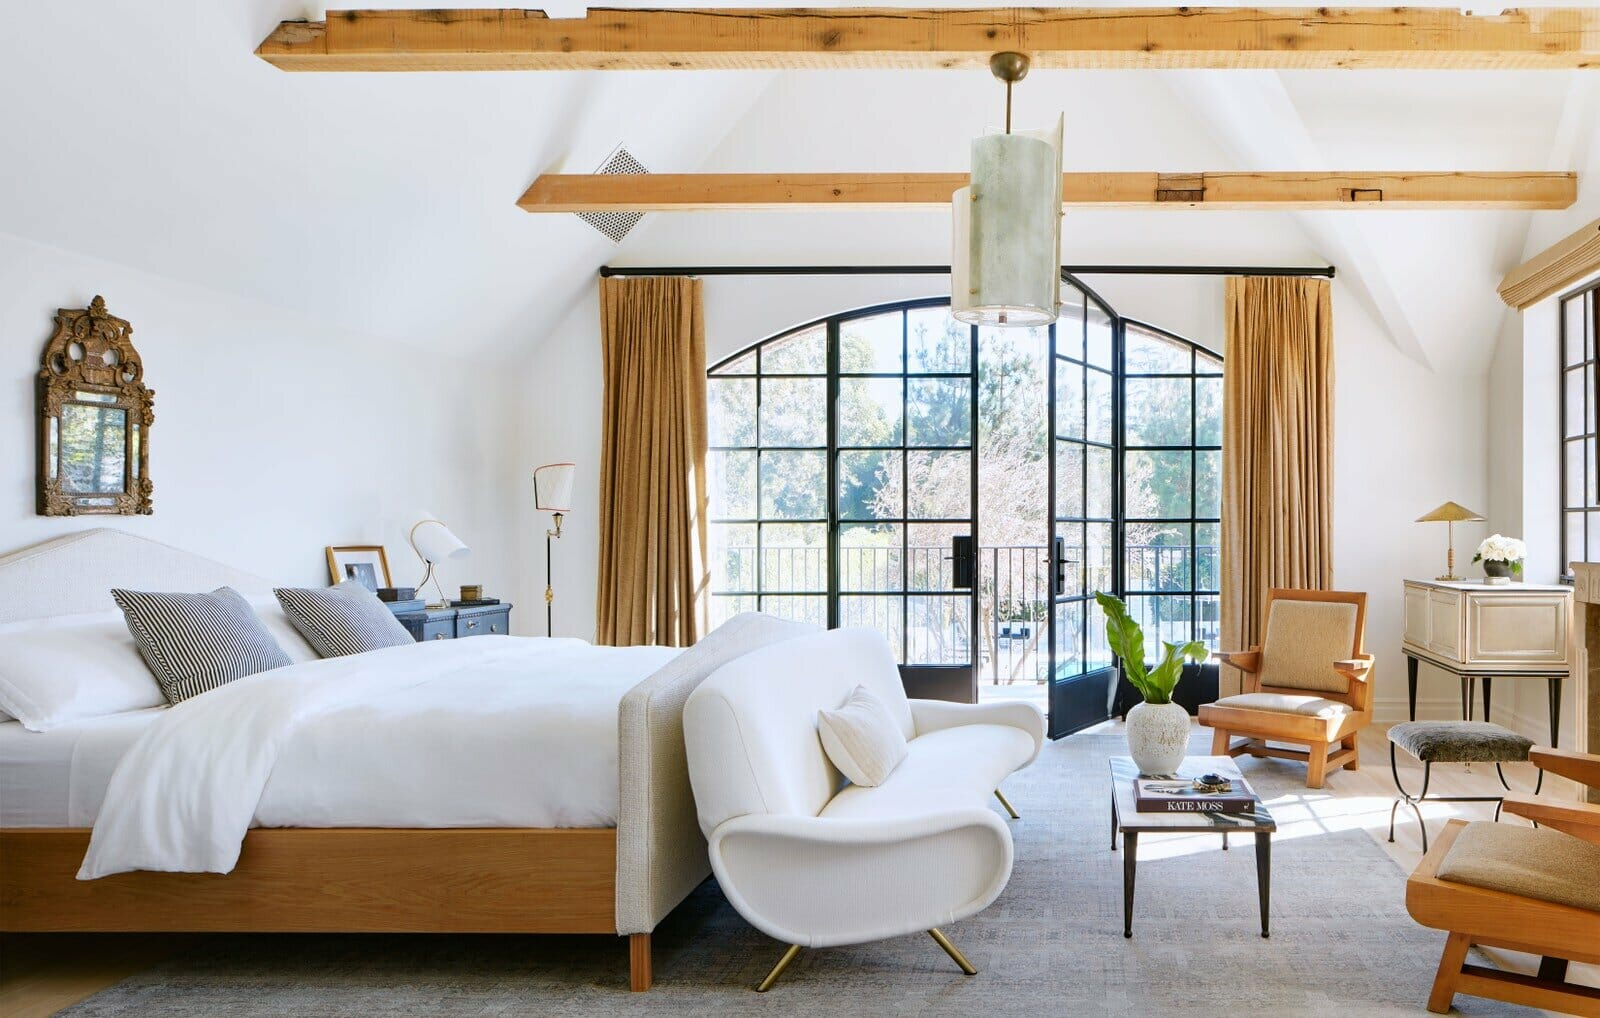 Modern rustic master bedroom ideas create a personal retreat - by Nate Berkus